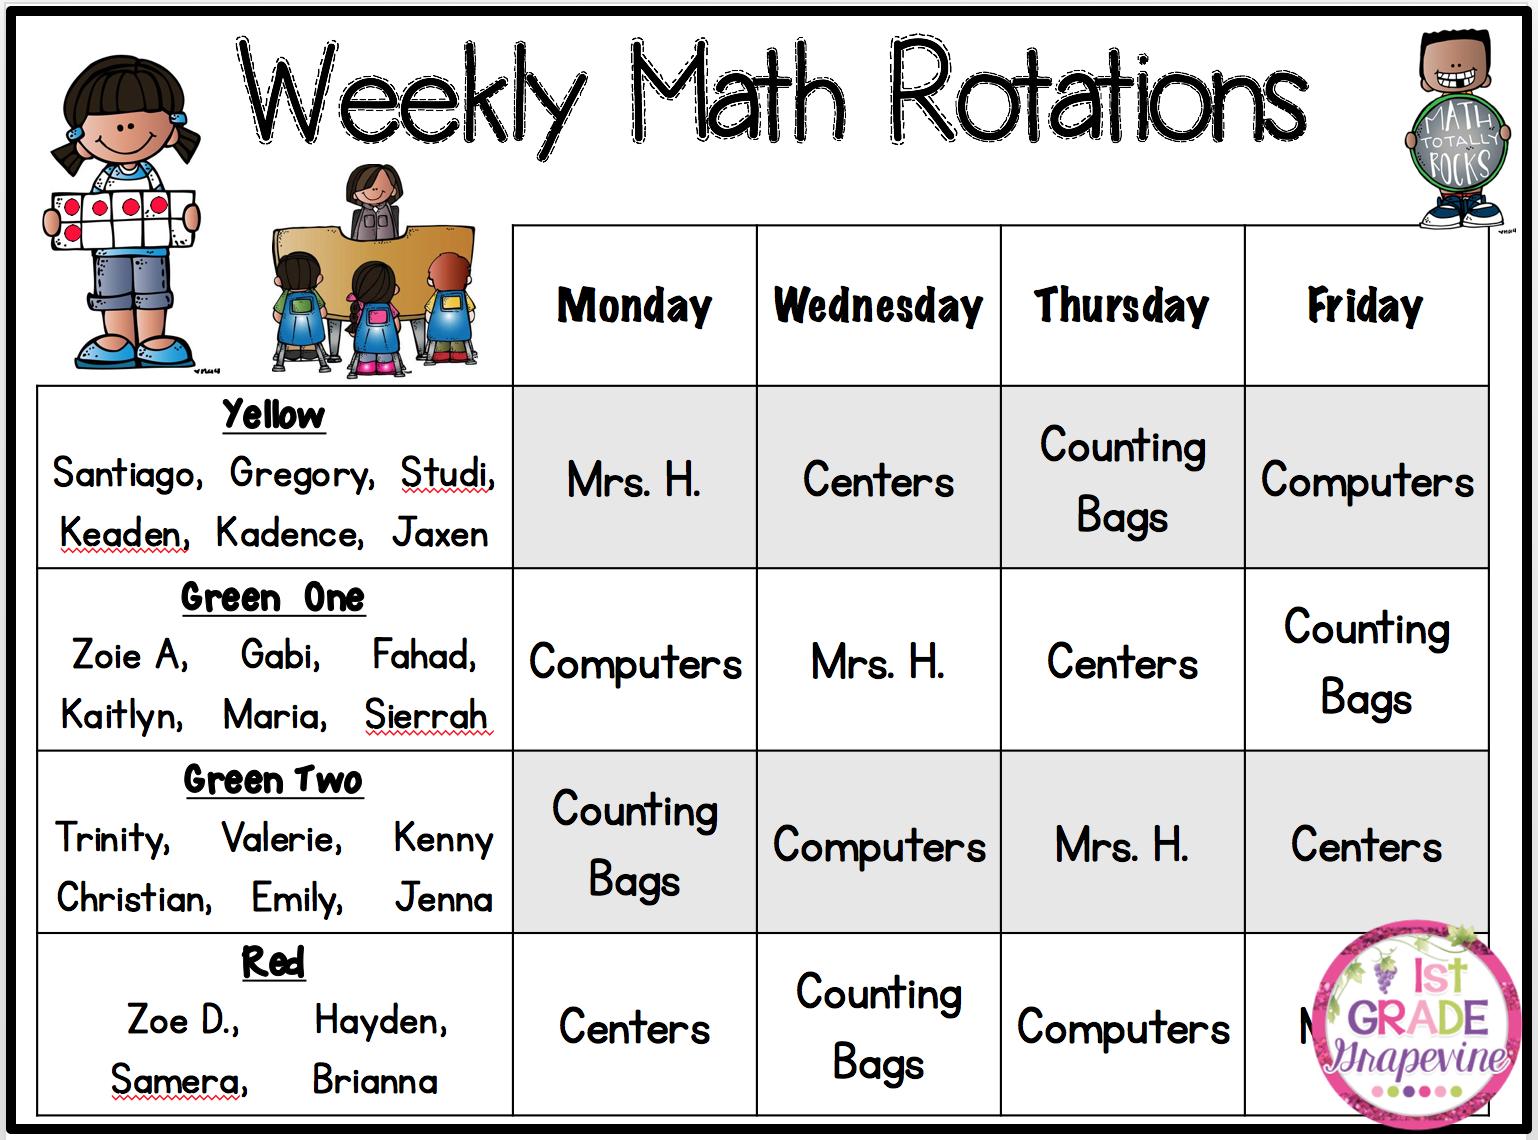 1st Grade G Vine Math Rotations Help Manage Centers